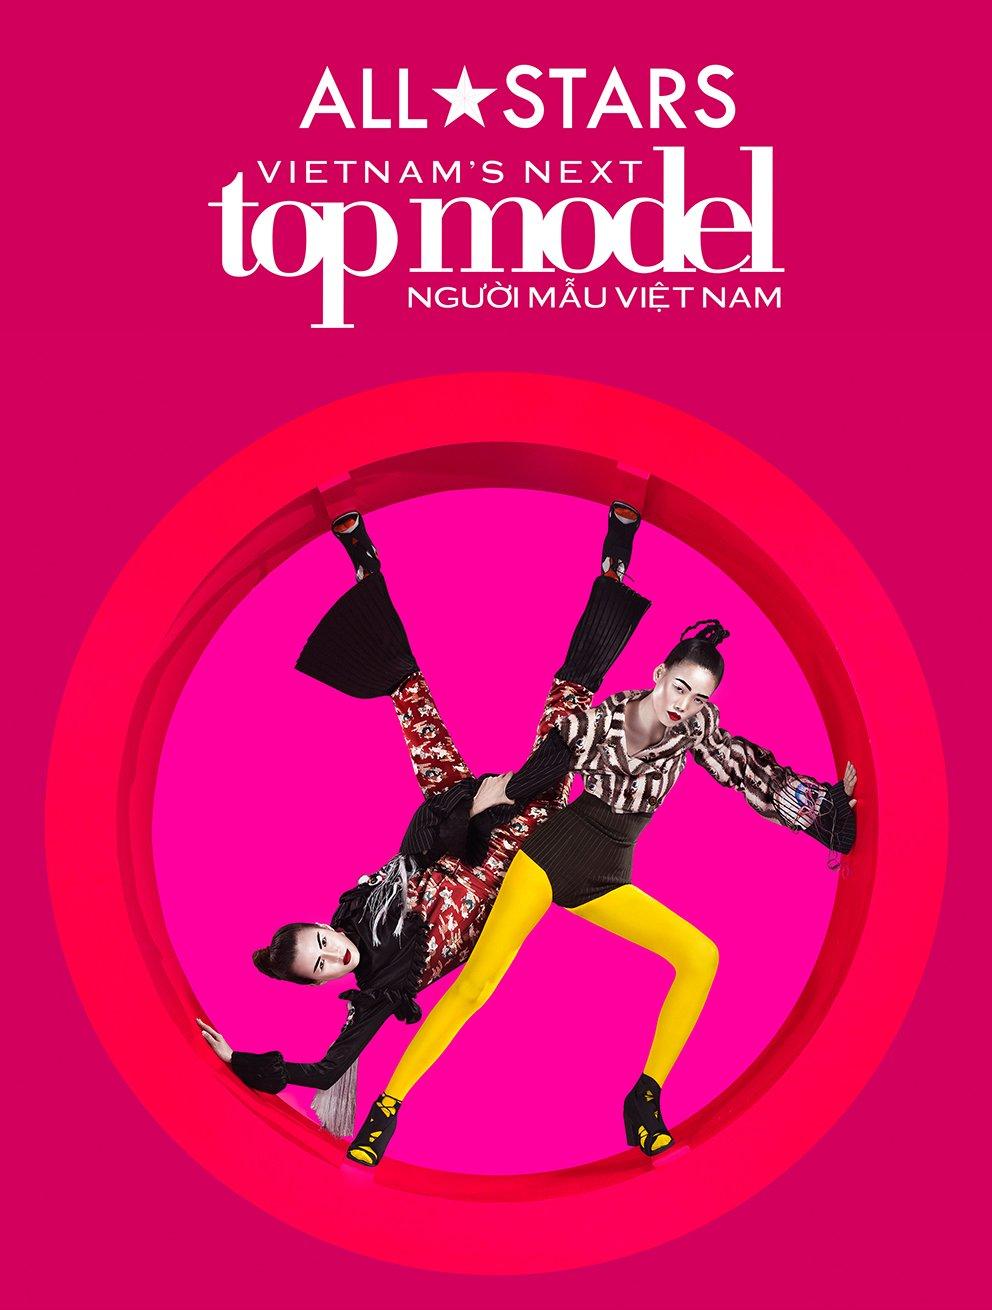 Nguyen Hop xoa danh hieu 'thanh dien' nho Vietnam's Next Top Model - All Stars hinh anh 3